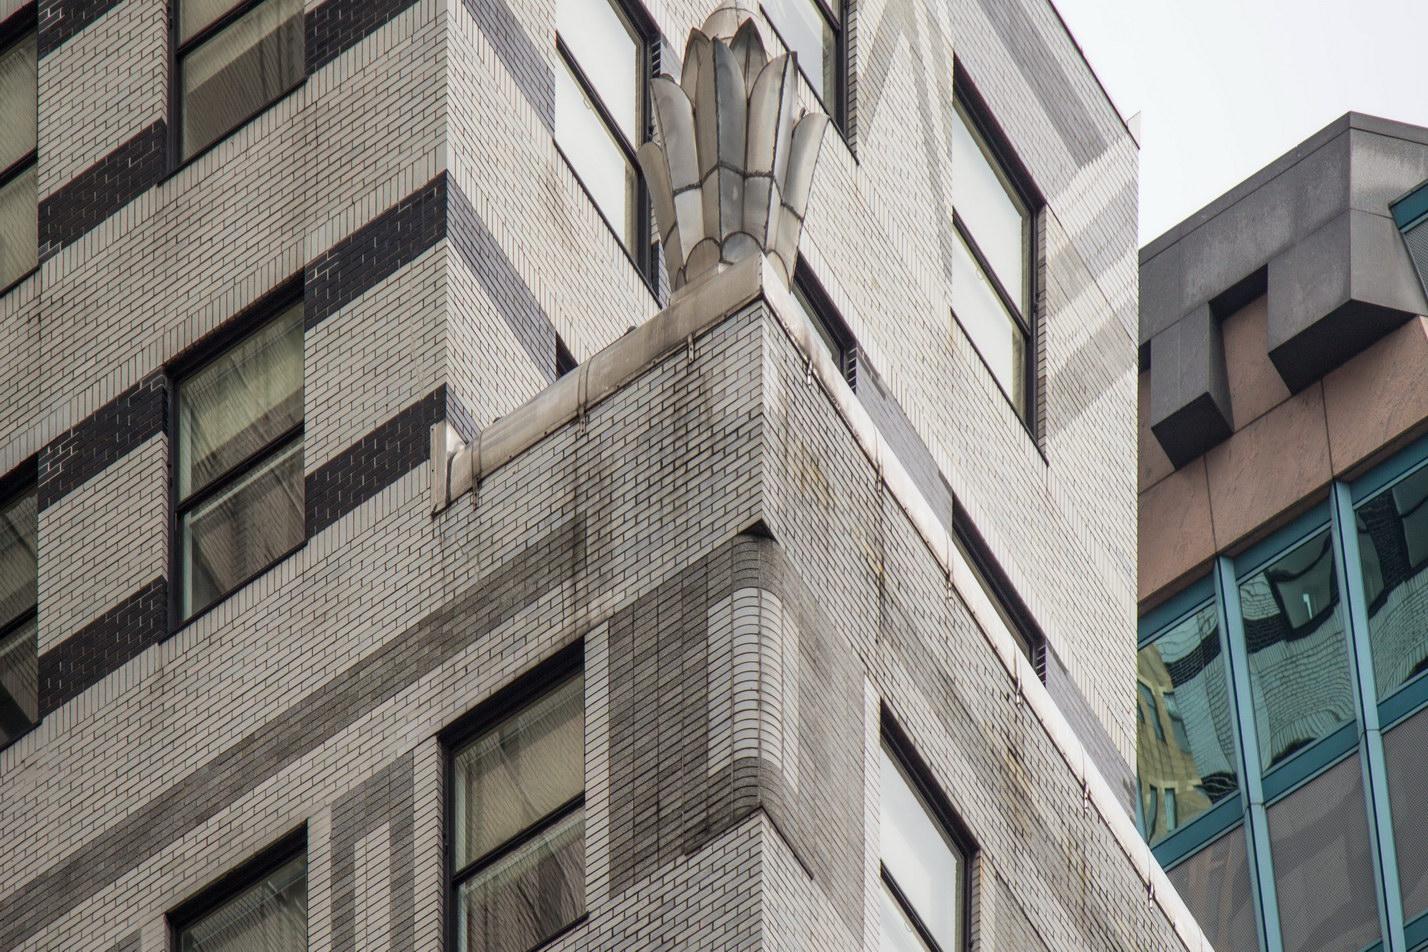 [Chrysler Building] IMG_0081 [8/27/2012 10:44:00 AM]